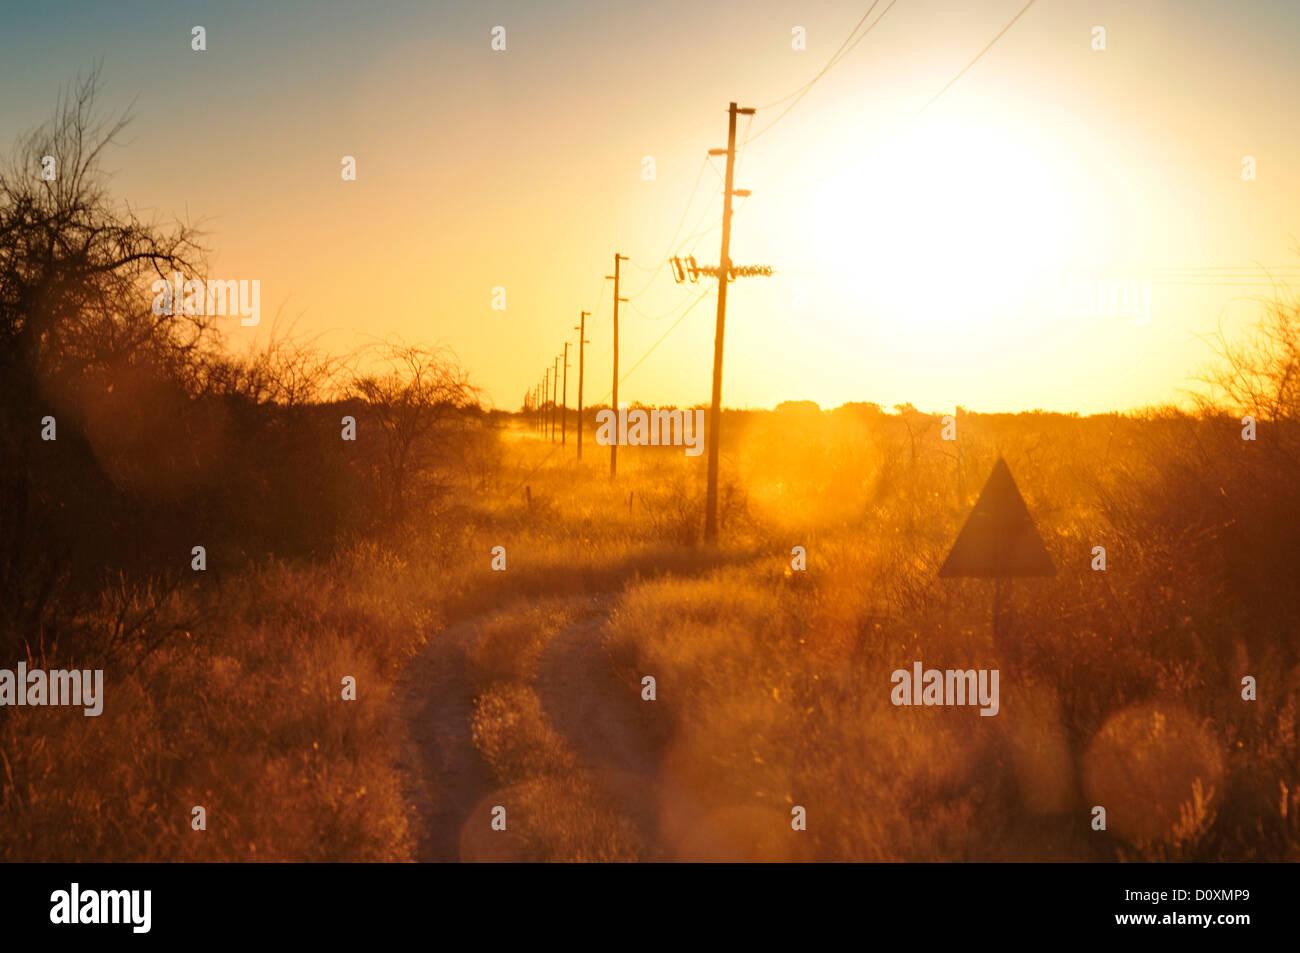 Afrika, Namibia, Warm, Clan, Abenddämmerung, Elektrik, Kabel, Feld, Hochspannung, horizontal Stockbild